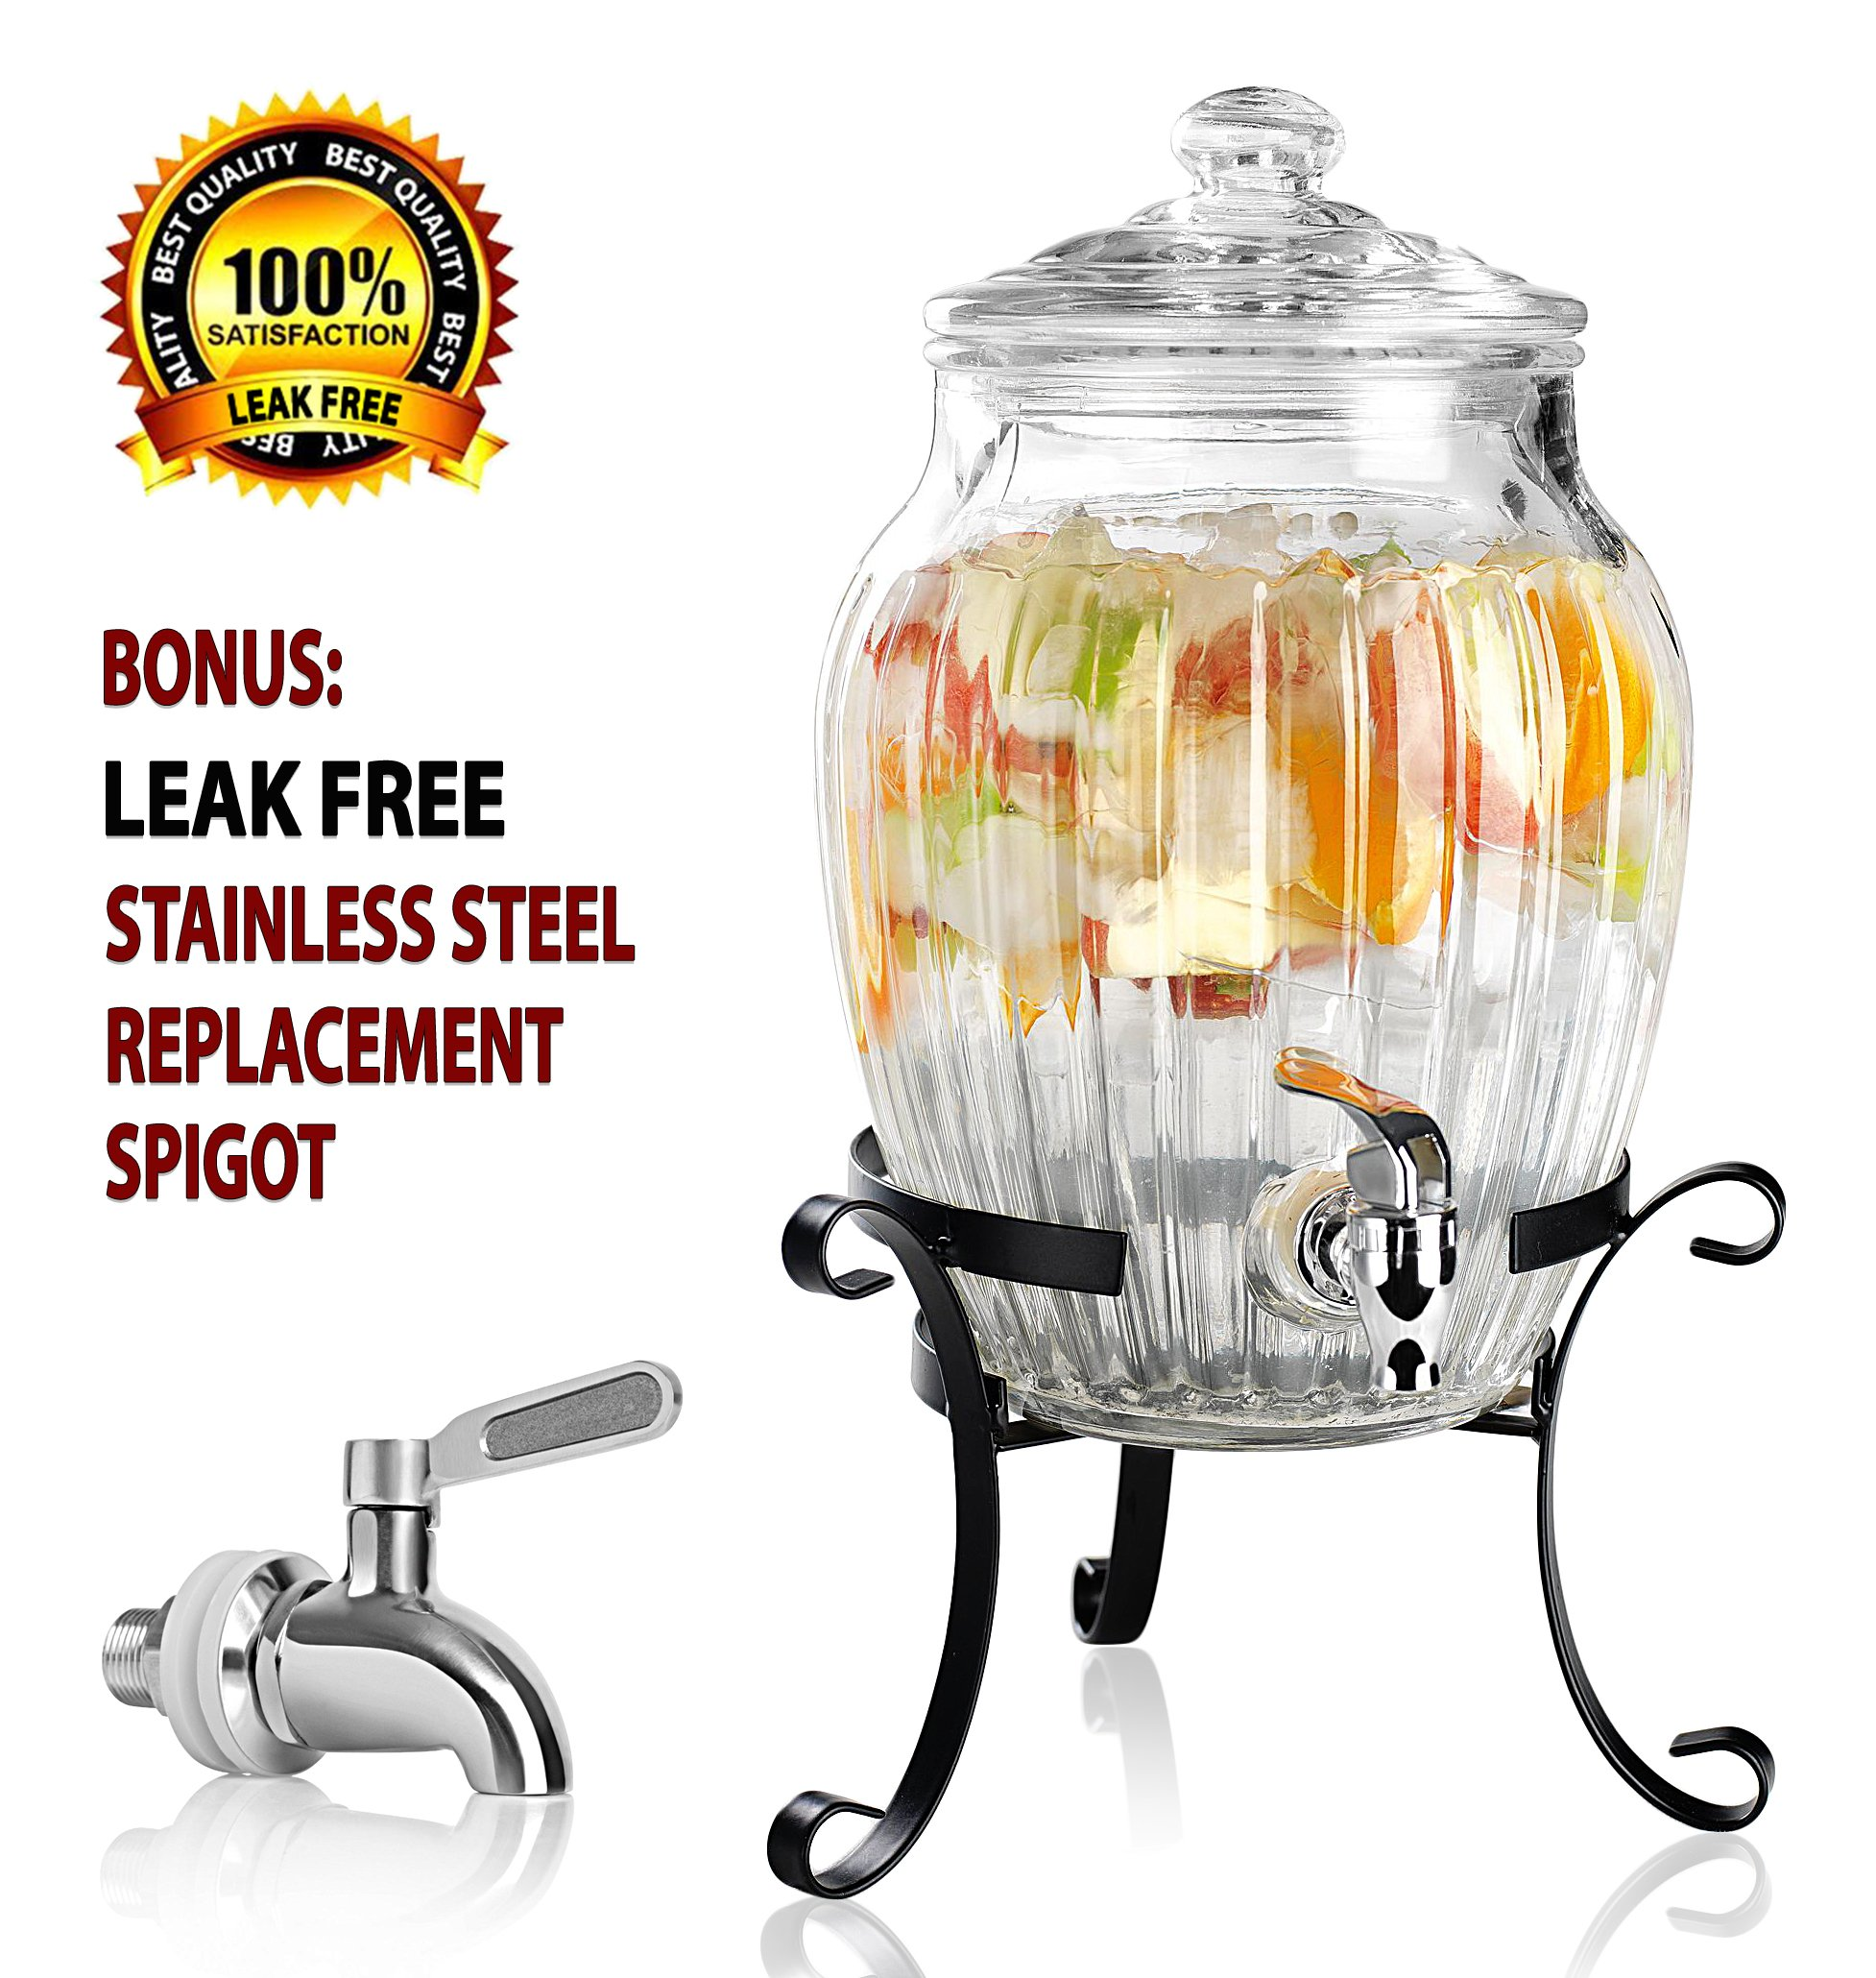 Clear Glass Vintage Drink Dispenser on Elegant Metal Rack Stand - 1.75 Gallon Capacity - Stainless Steel Leak Free Spigot Included - Home Bar & Party Beverage Server